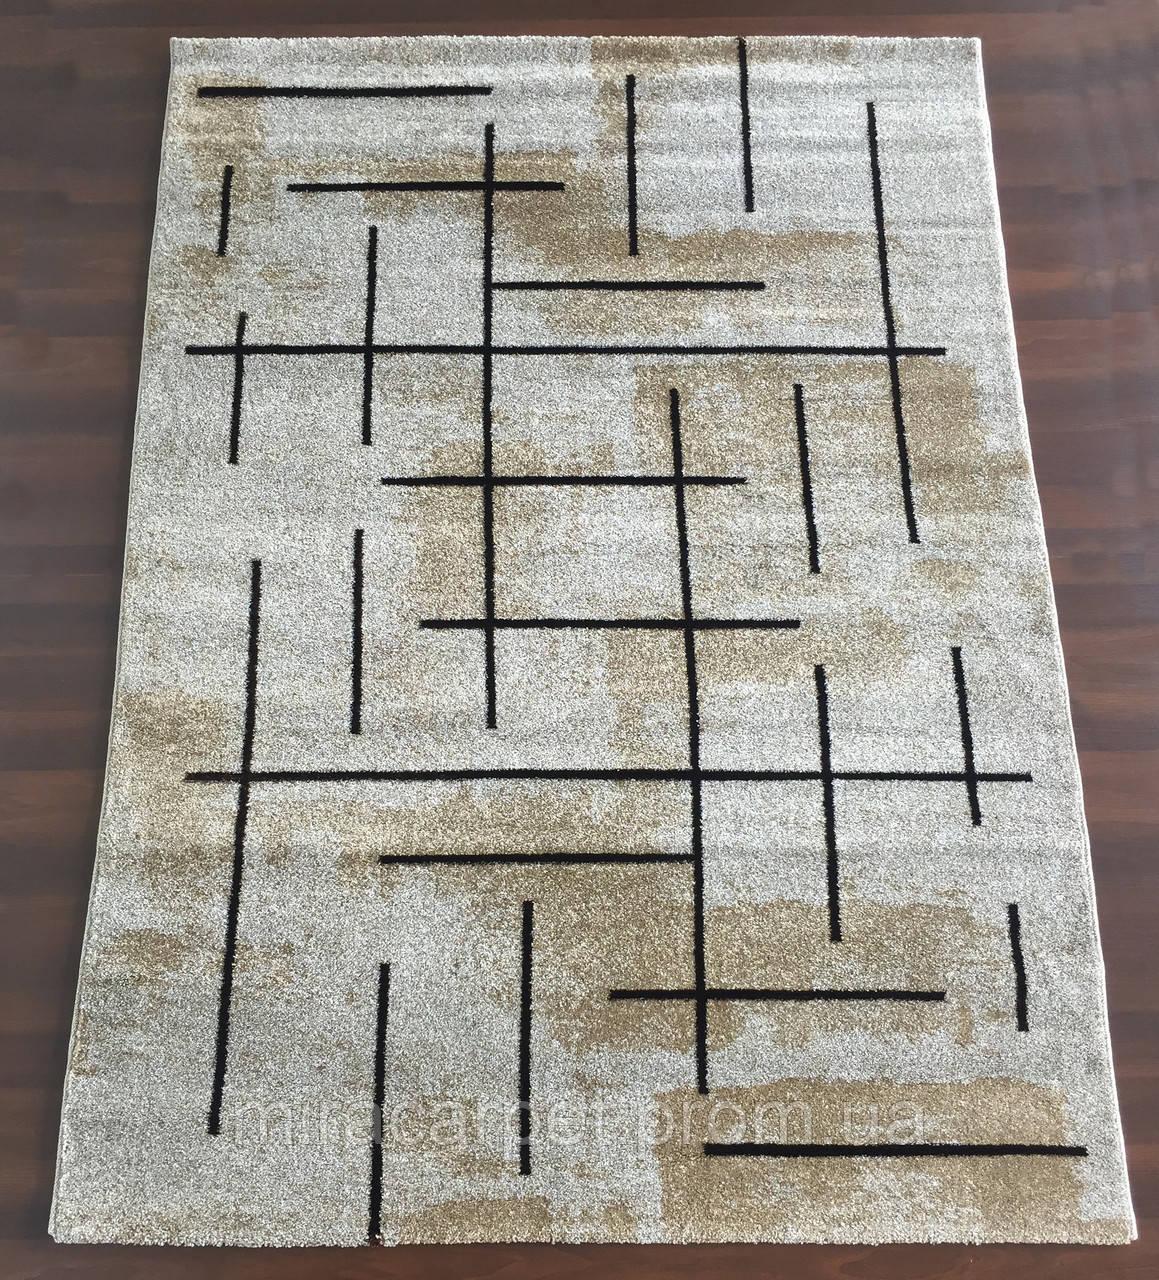 Турецкий серо-коричневый ковер